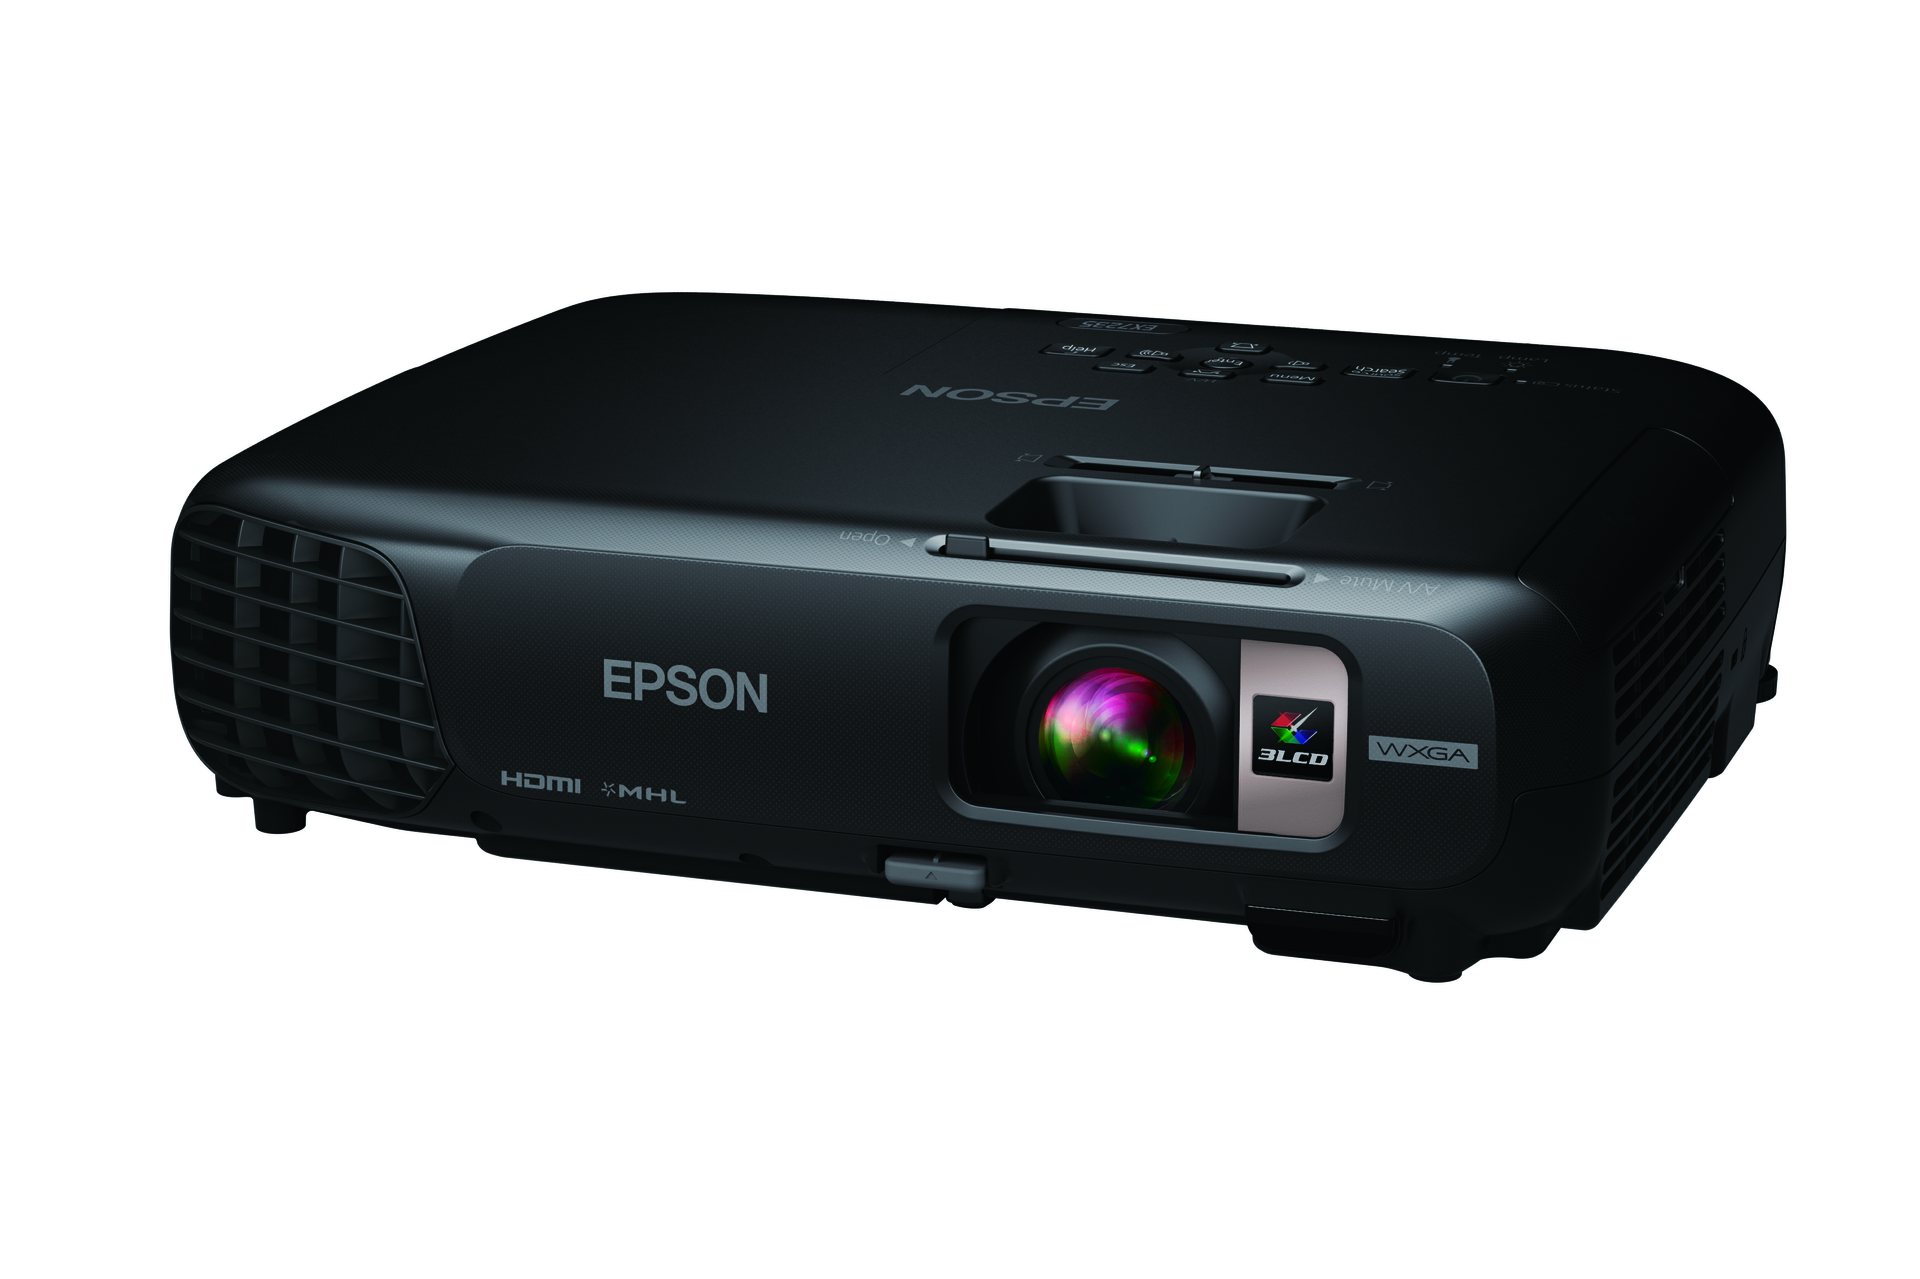 Epson EX7235 Pro_LT_ANG